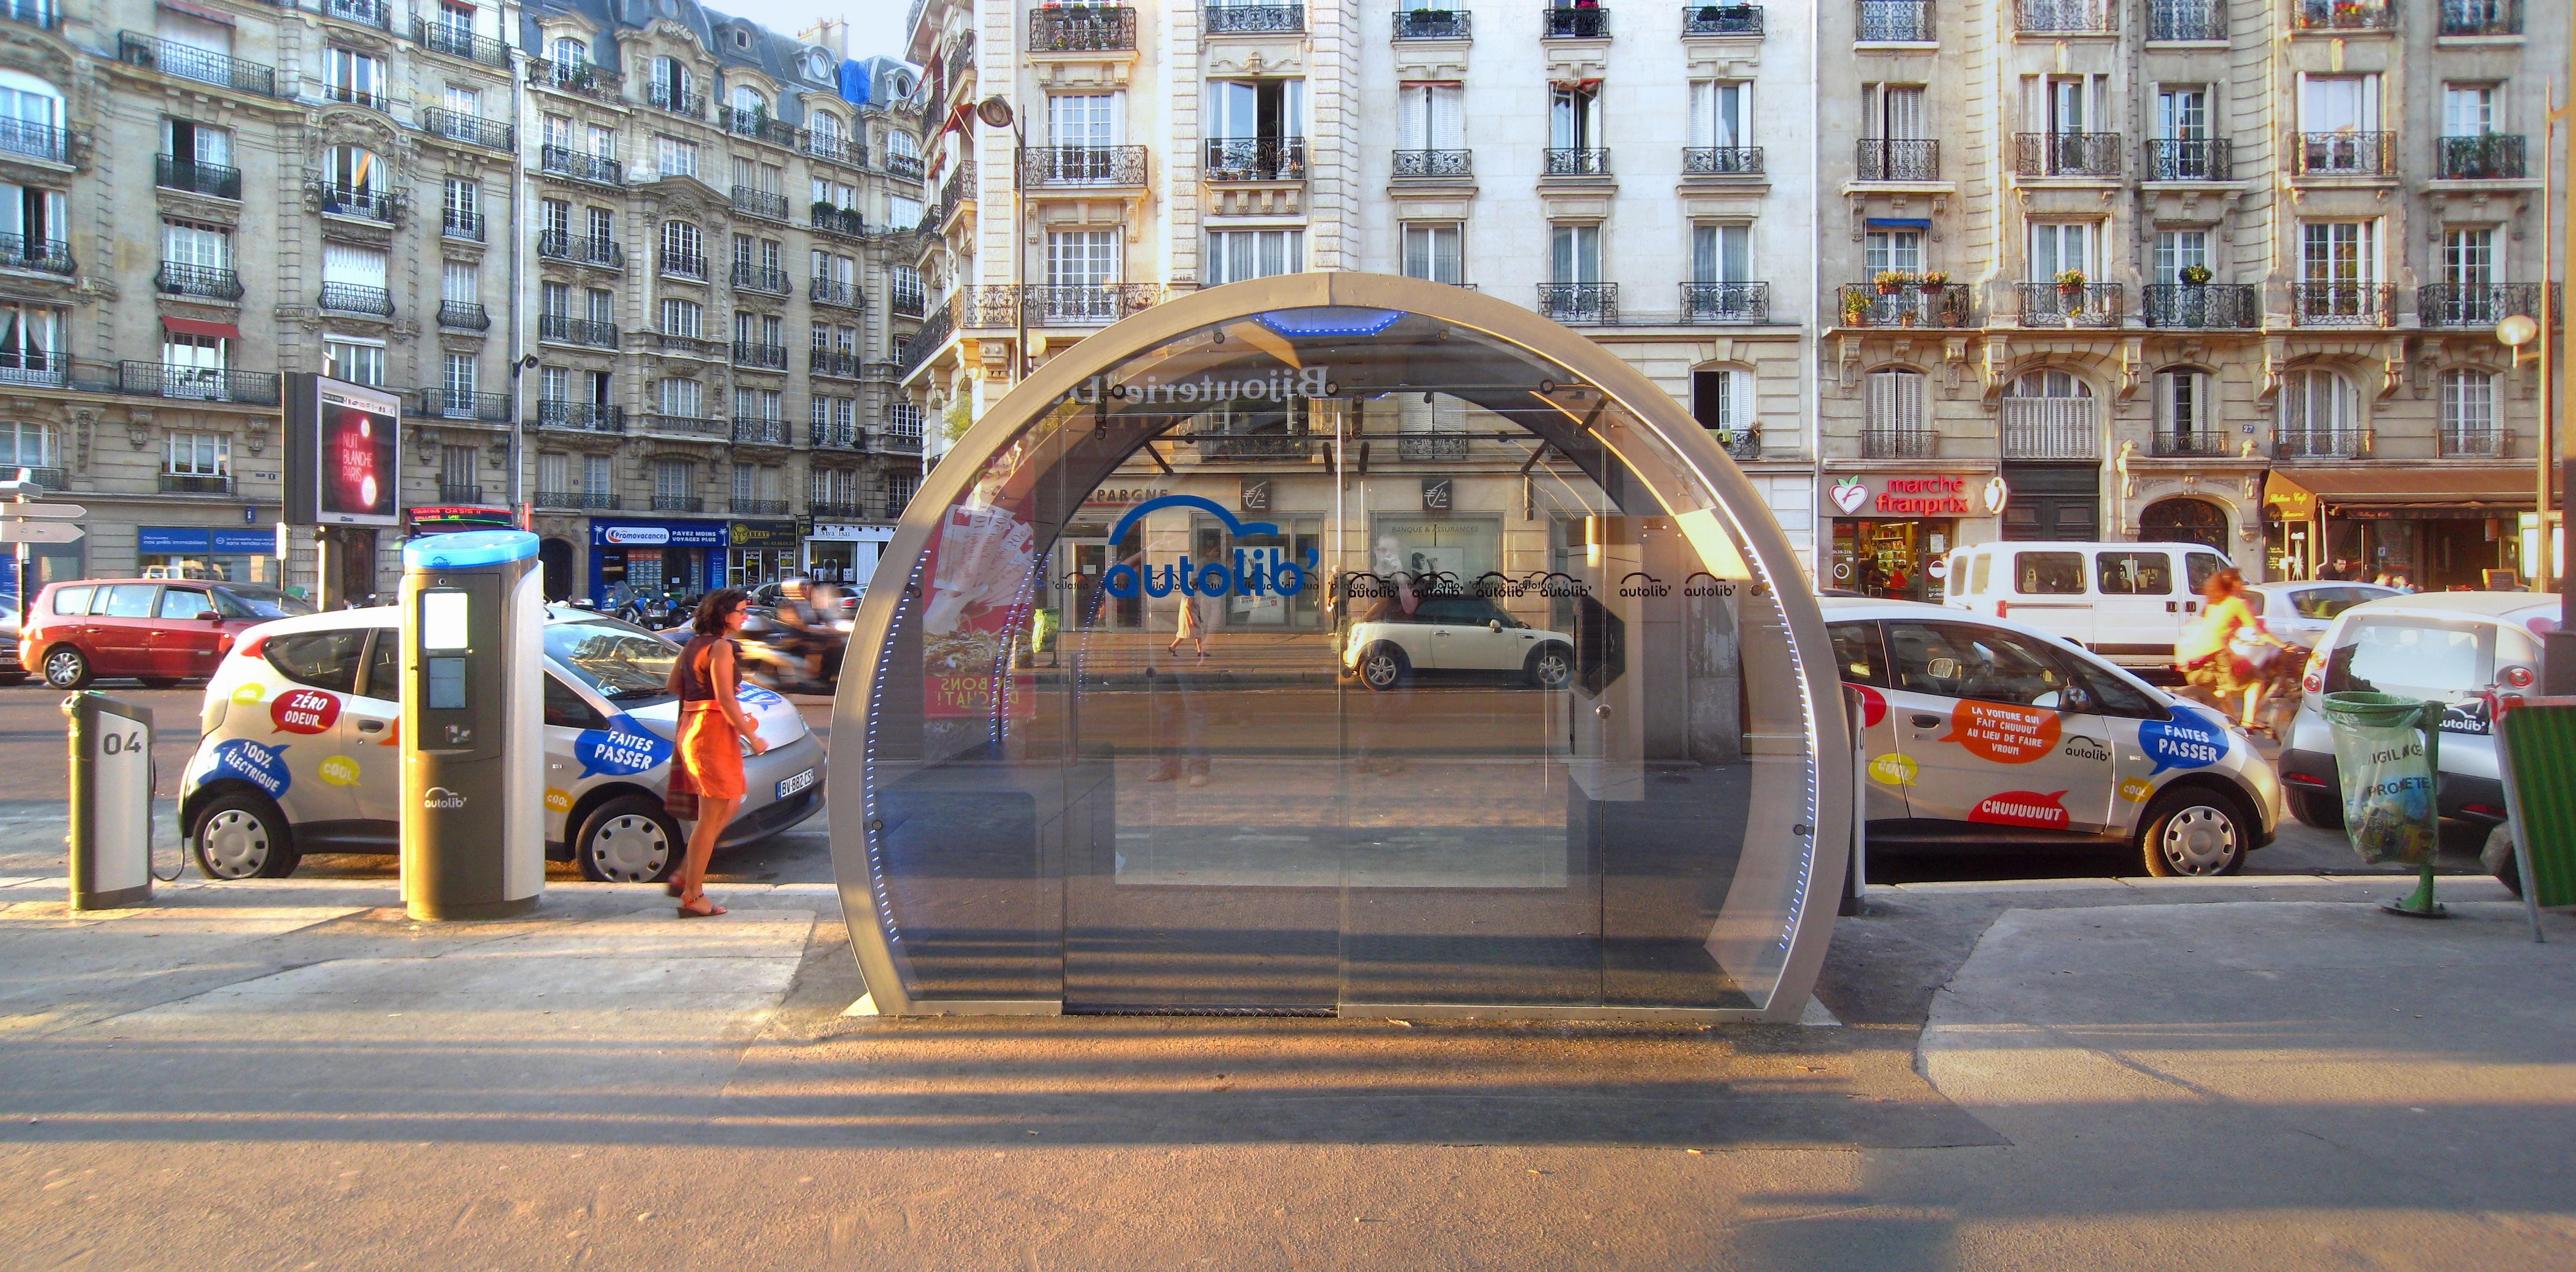 Autolib%27_Station%2C_Paris%2C_Boulevard_Diderot_01.jpg